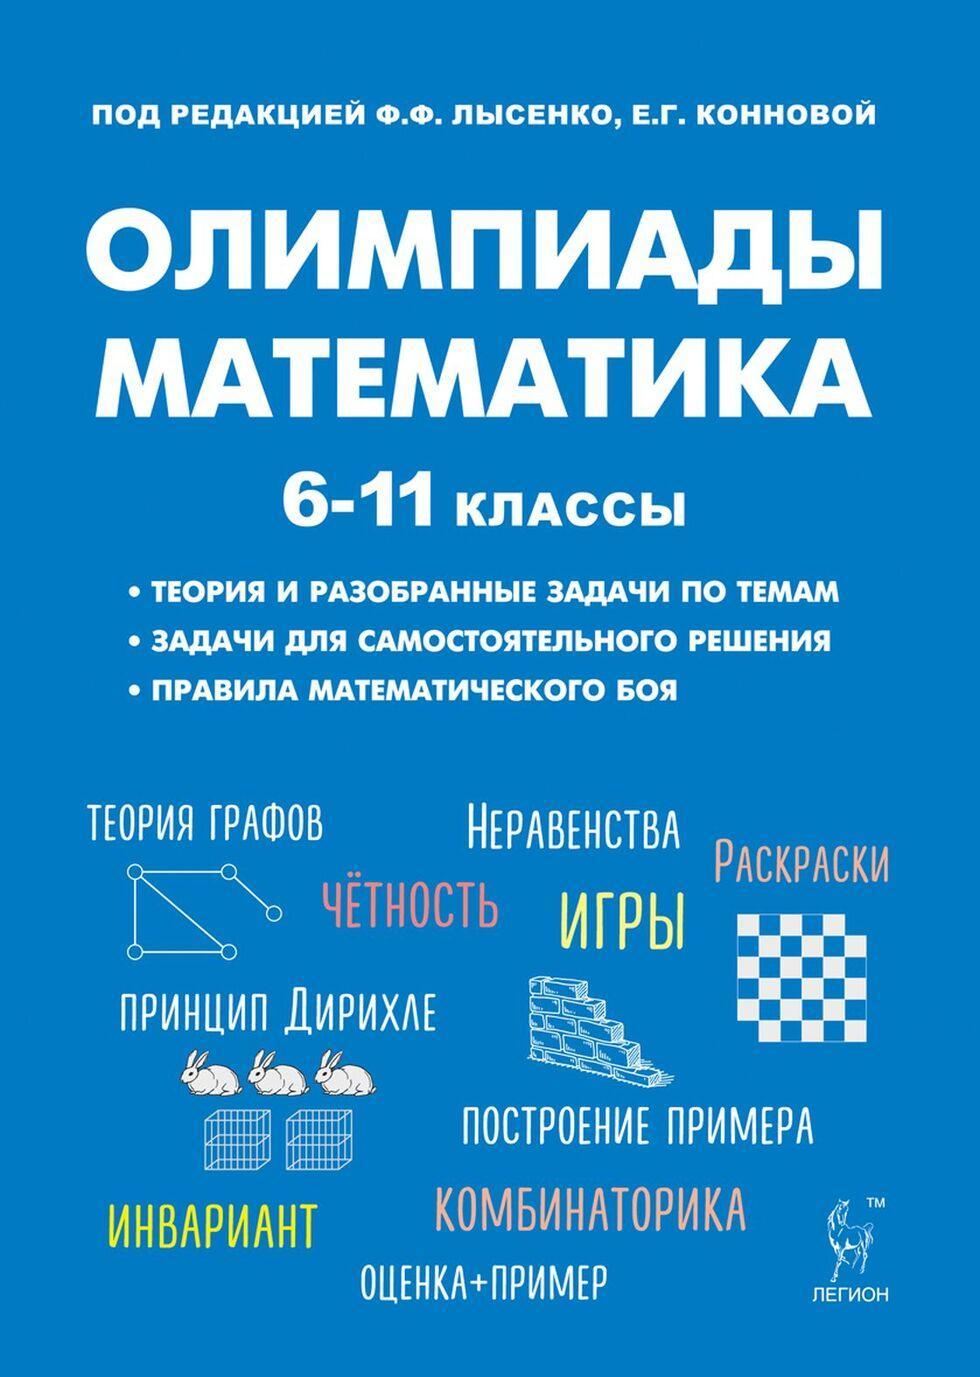 Matematika. 6-11 kl. Podgotovka k olimpiadam